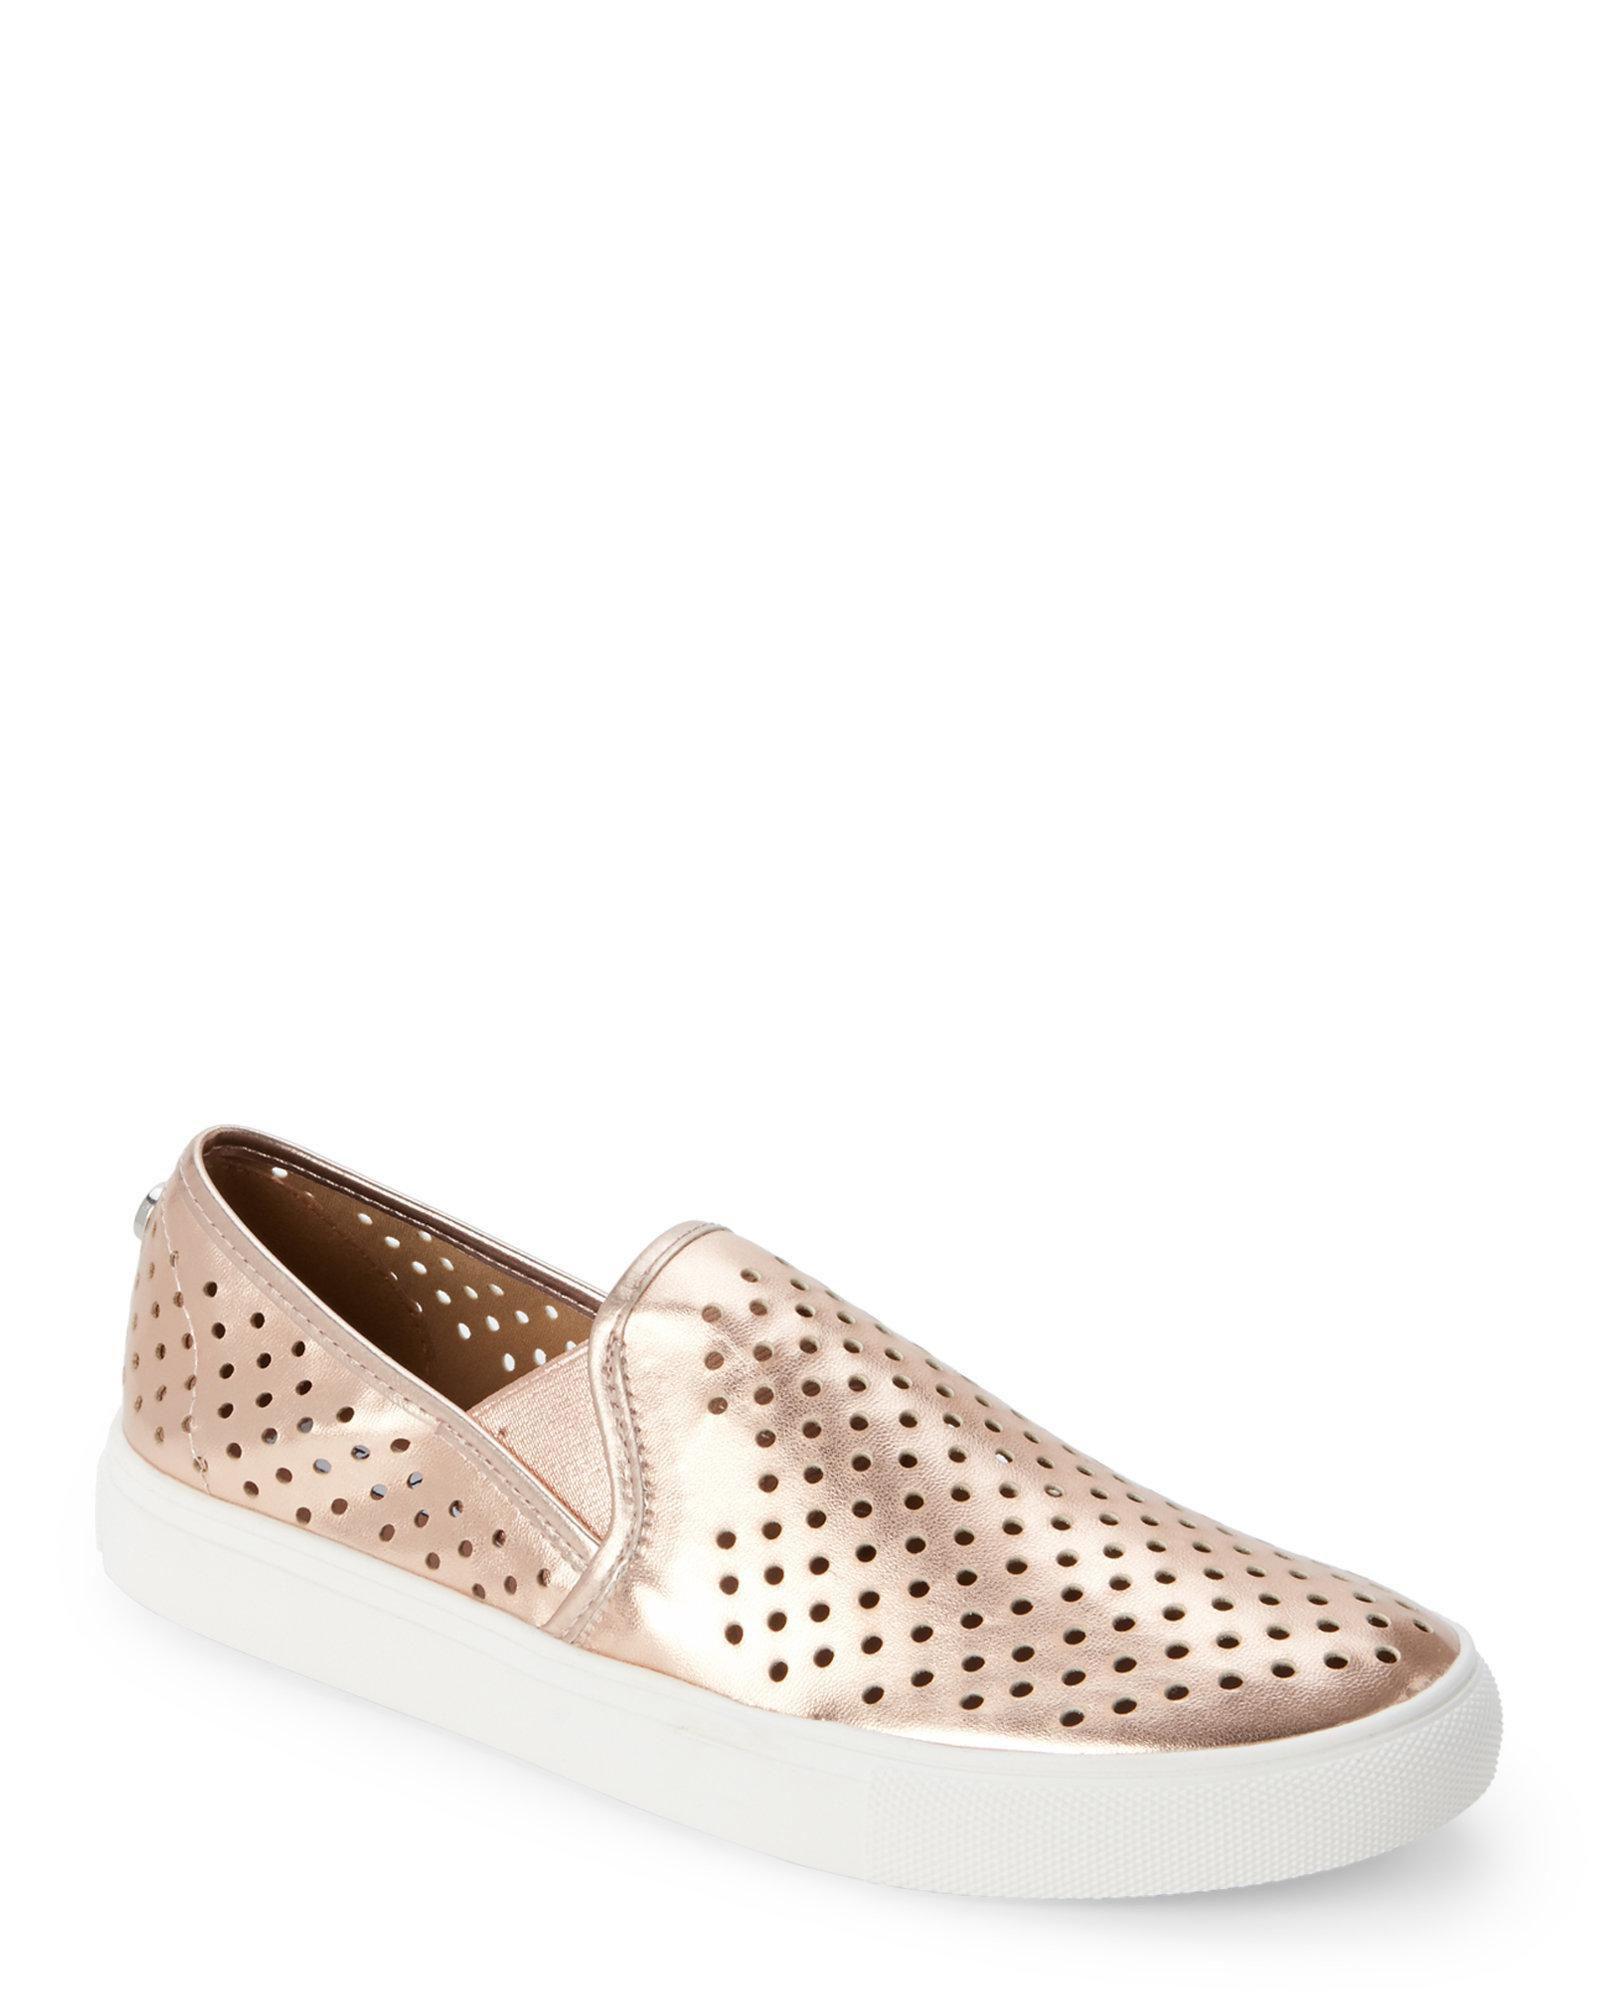 840222be26d Steven by Steve Madden. Pink Womens Owen Low Top Slip On Fashion Sneakers